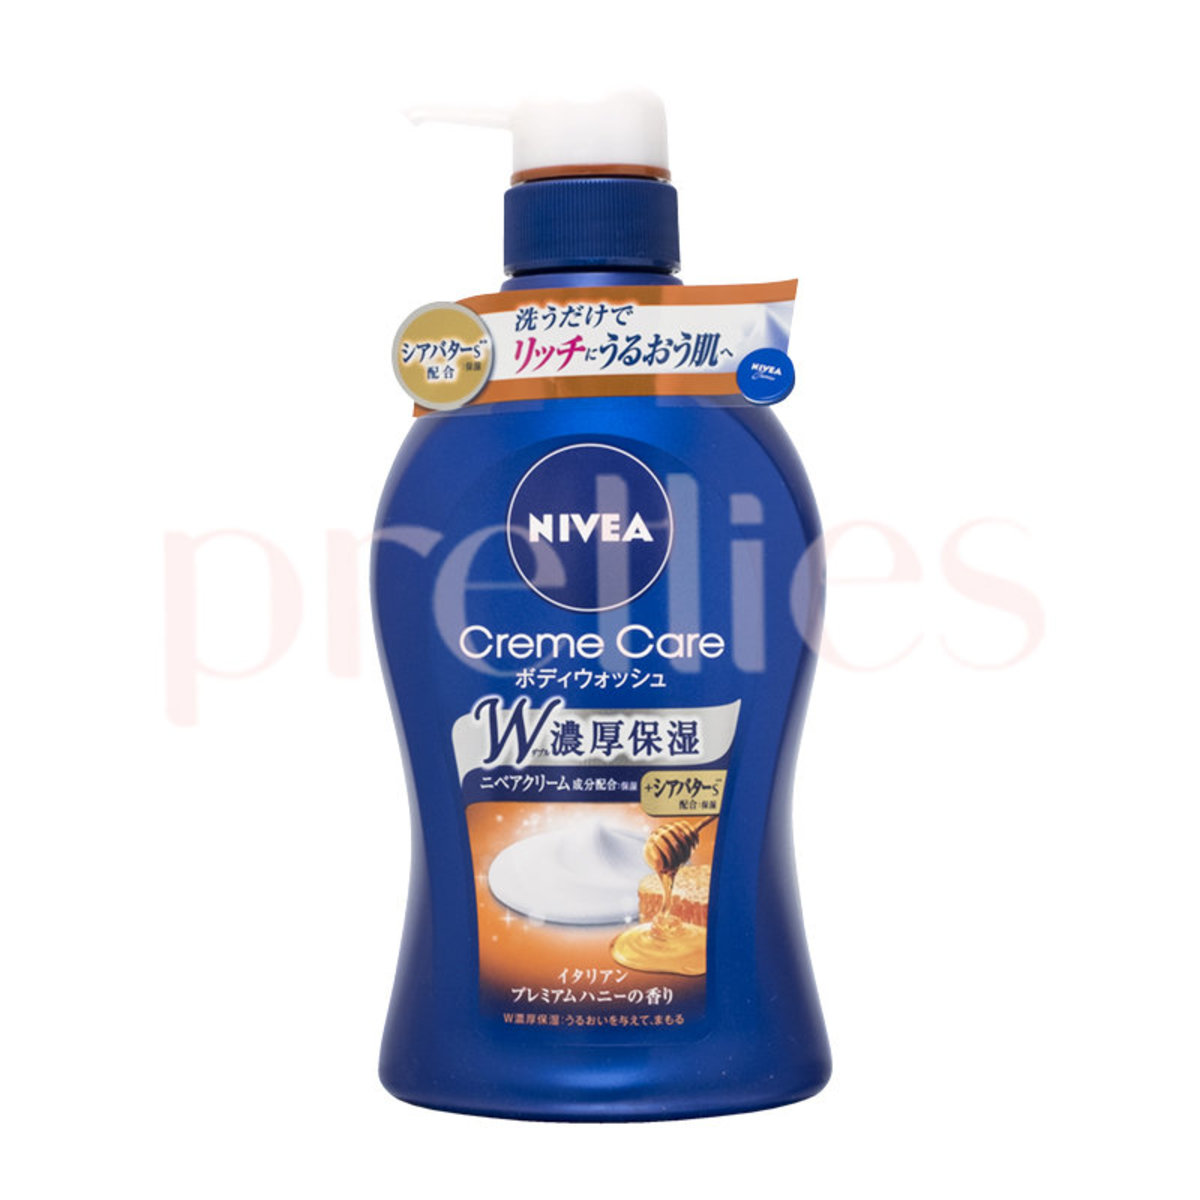 Creme Care Body Wash (Honey) 480ml (4901301326478) (Parallel Import)